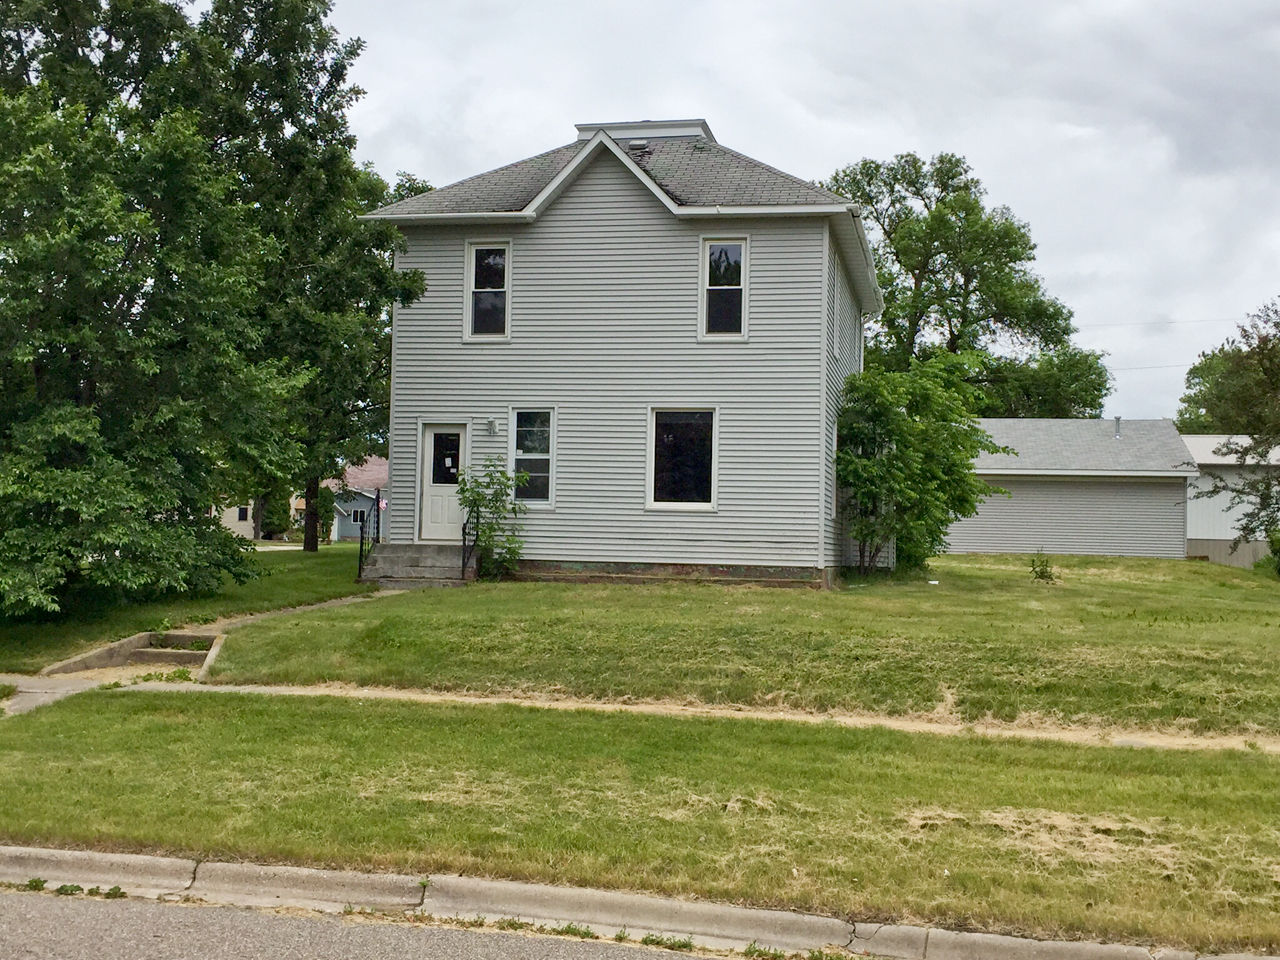 22 Grand Ave N, Kensington, Minnesota 56343